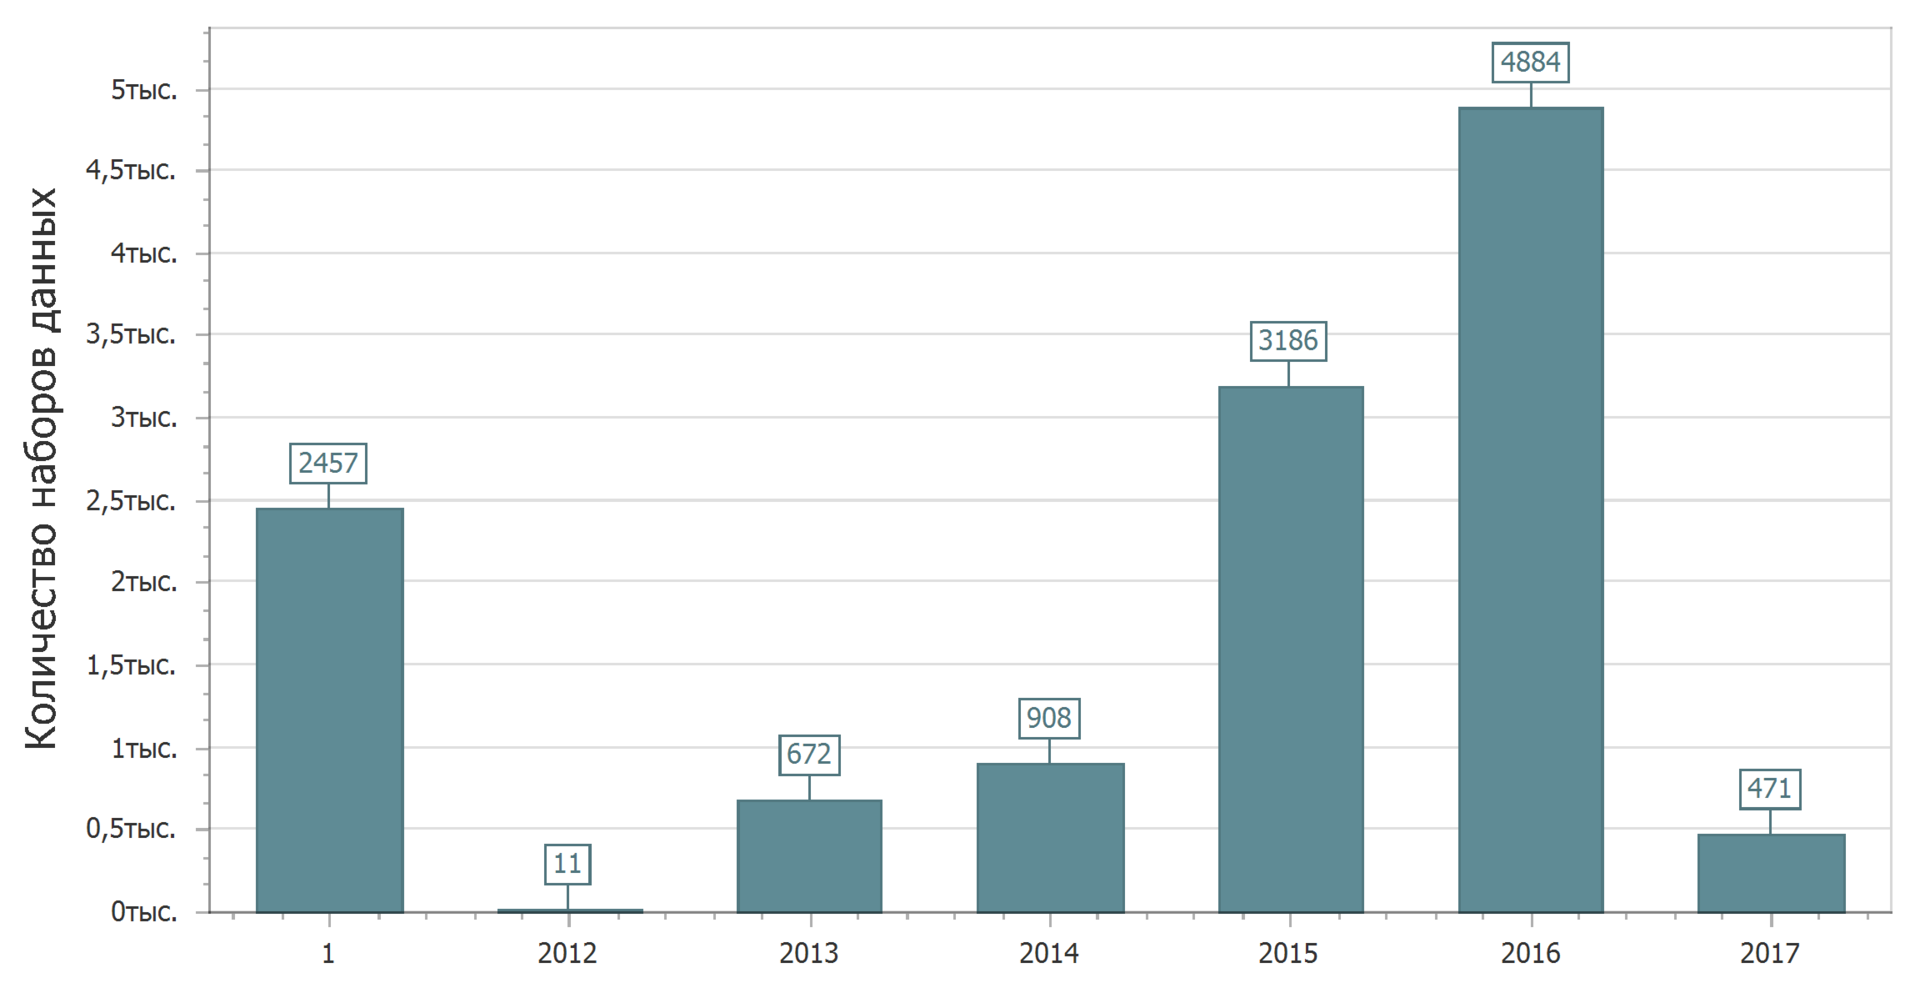 Анализ наборов данных с портала открытых данных data.gov.ru - 4